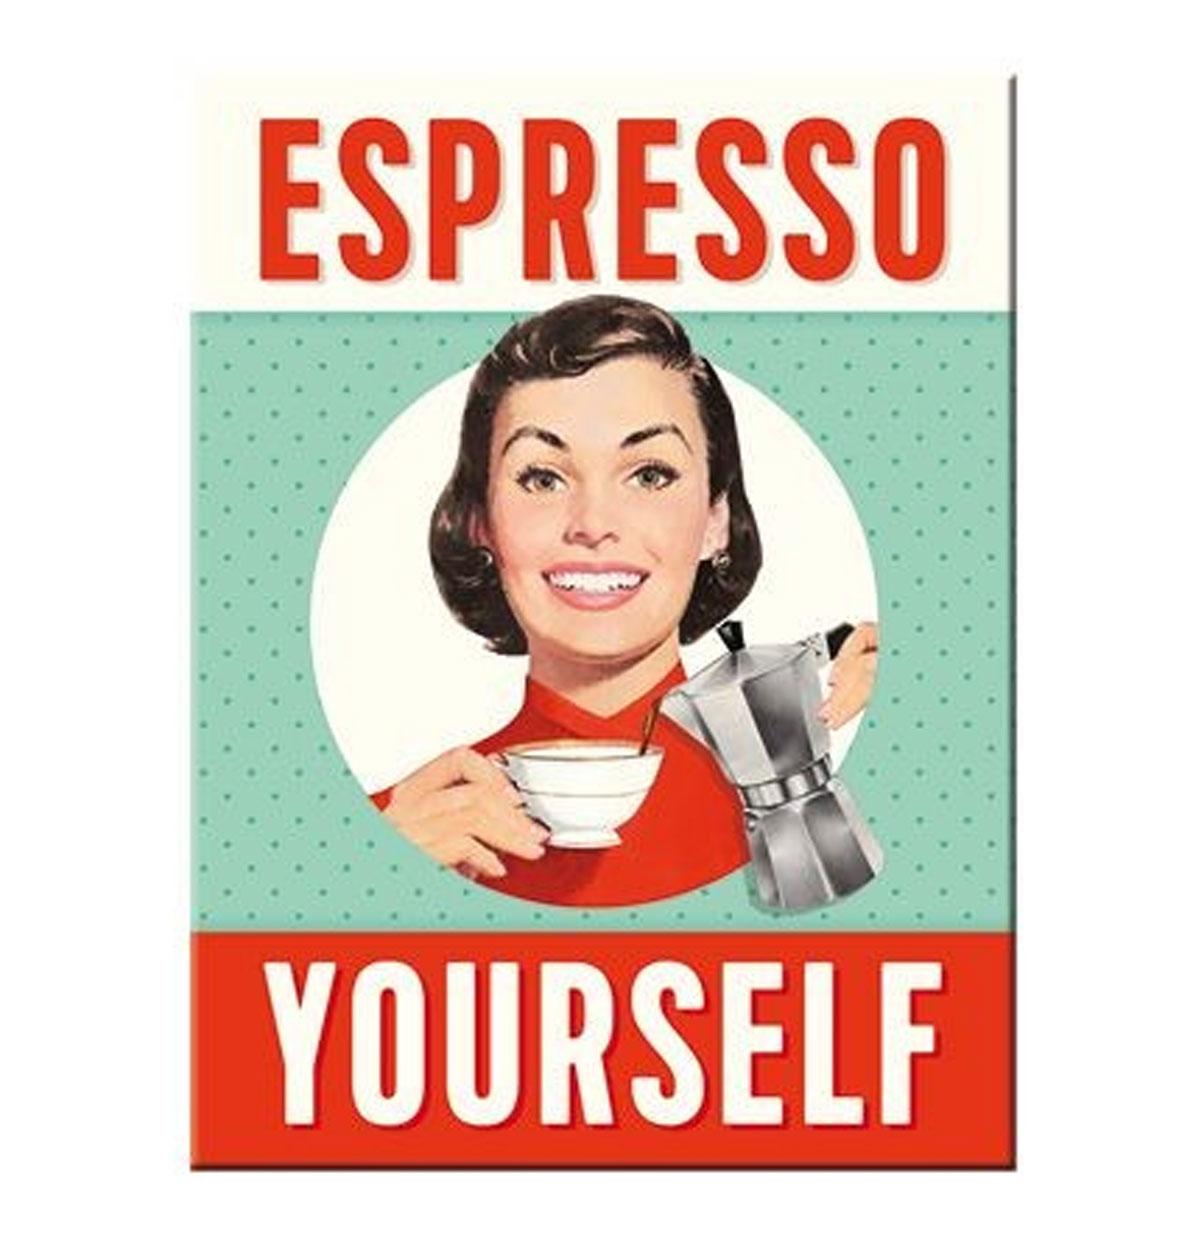 Espresso Yourself Magneet